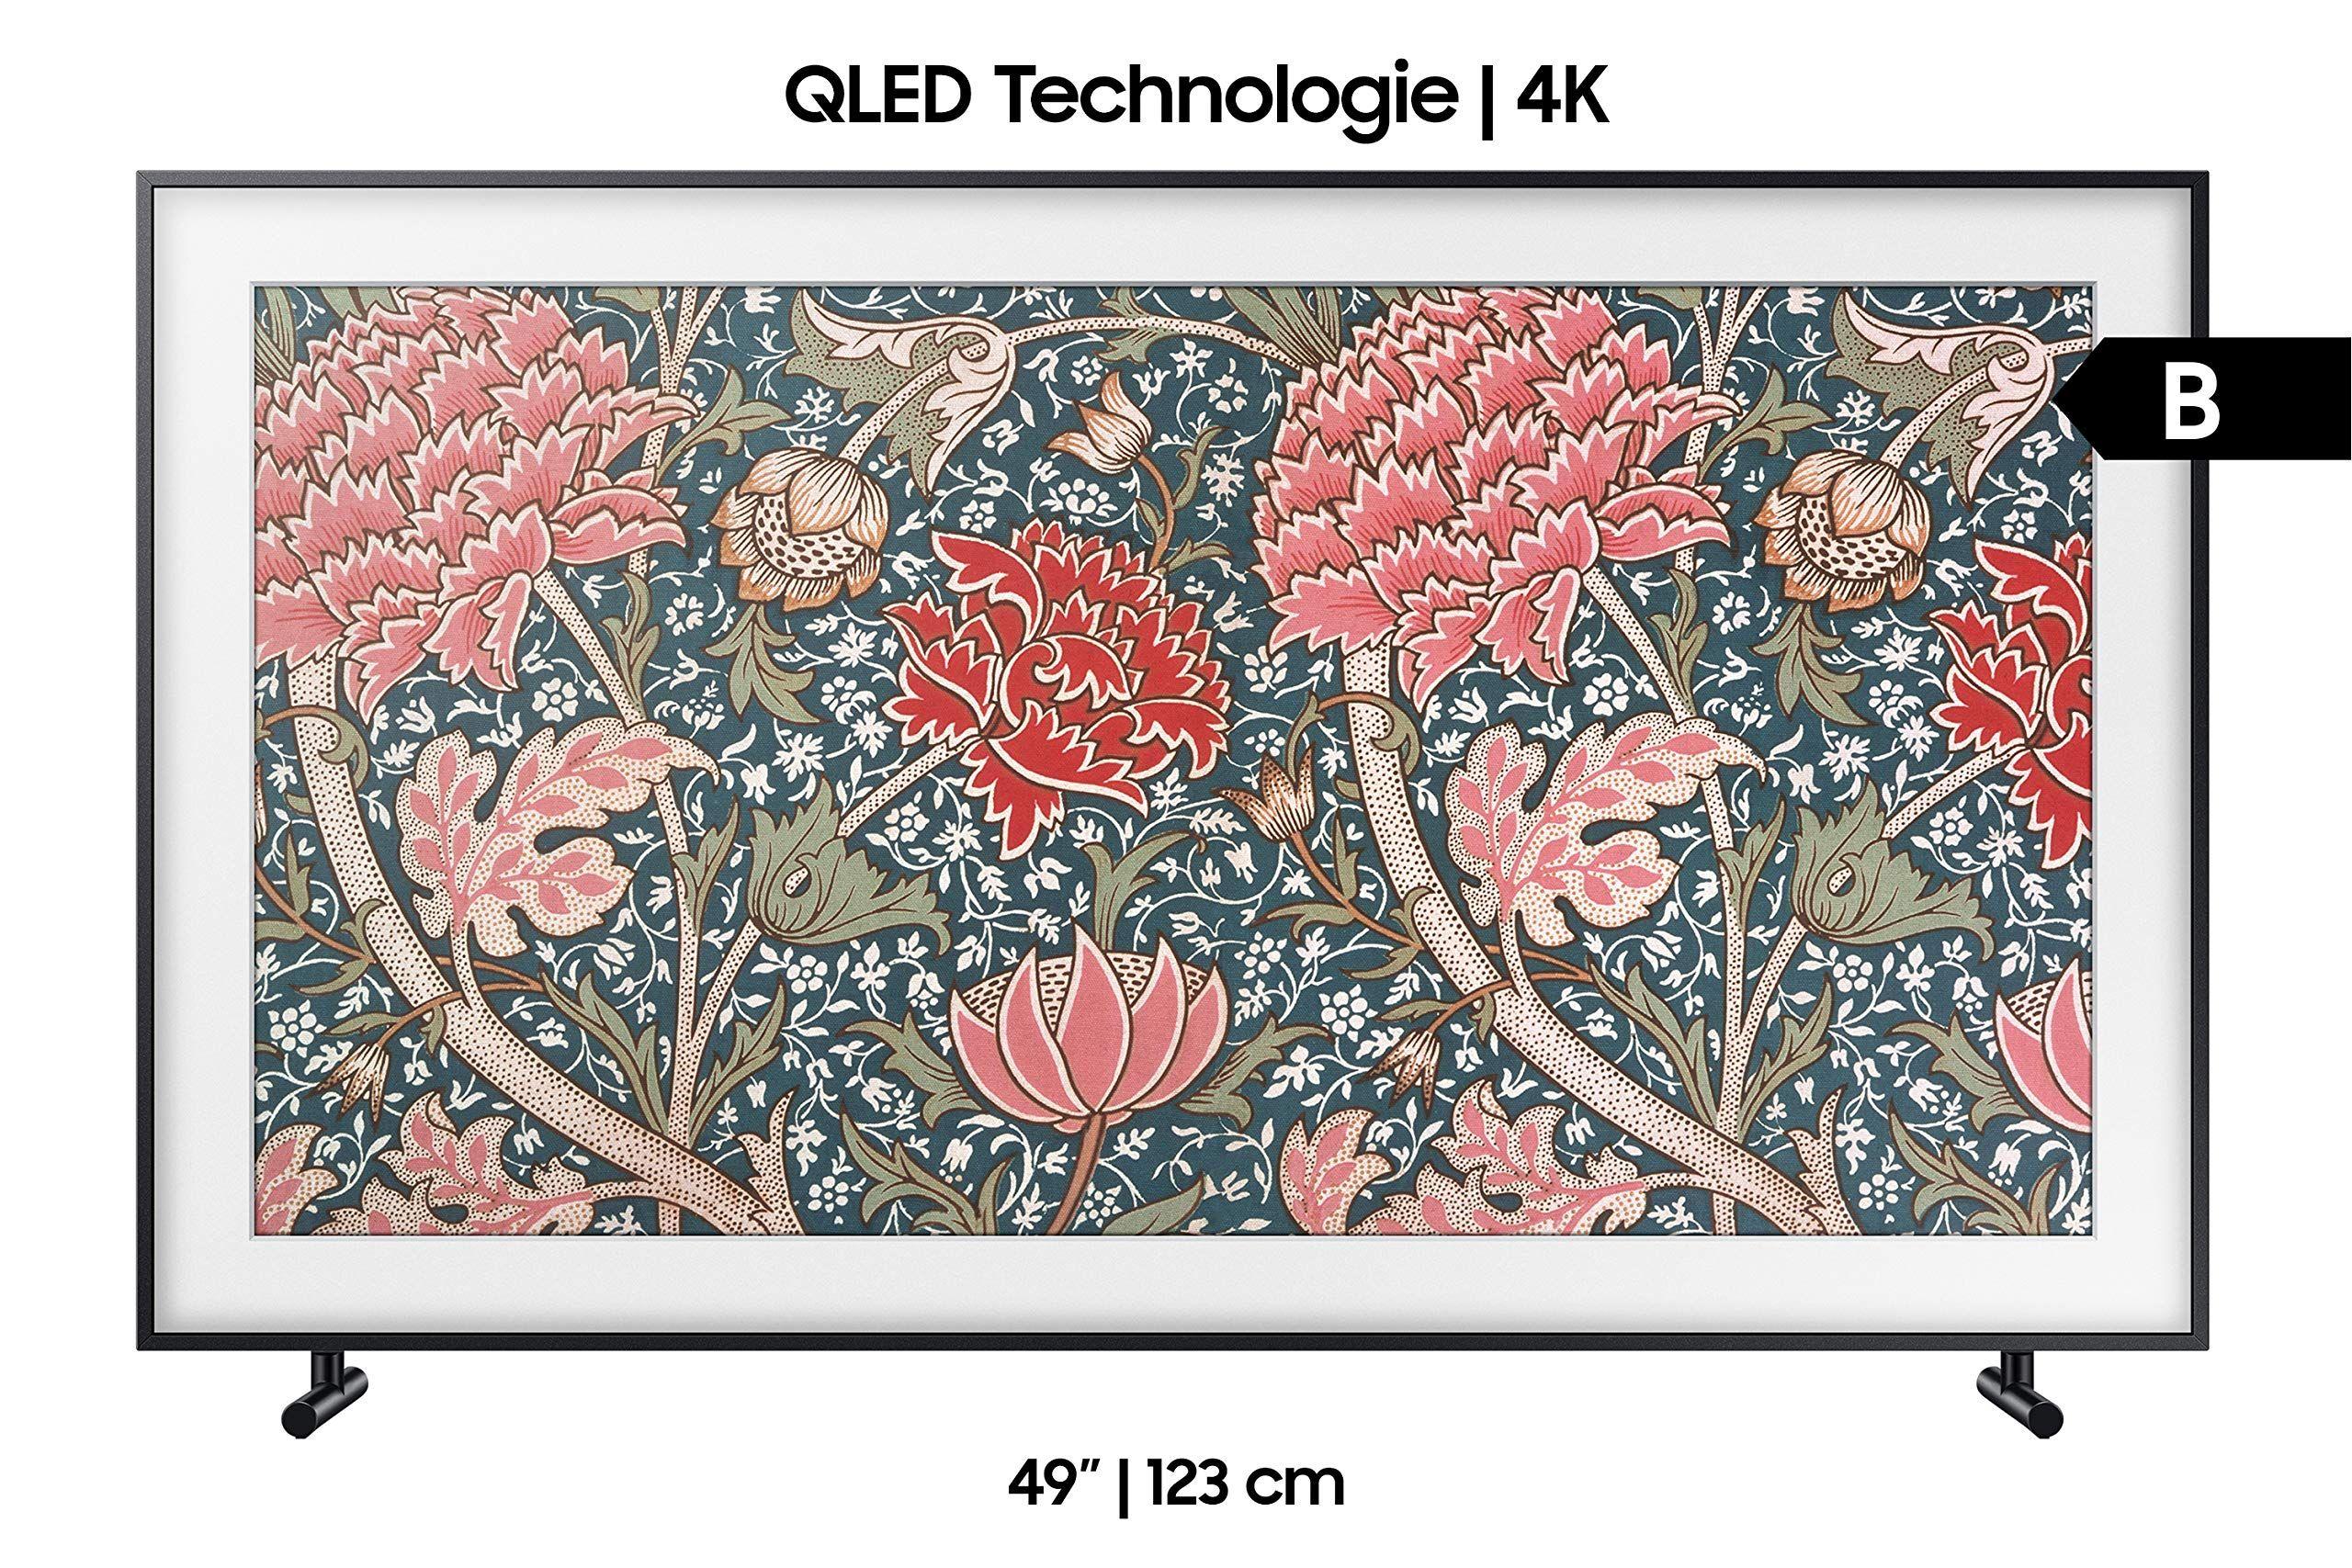 Samsung Ls03r The Frame 123 Cm 49 Zoll Qled Lifestyle Fernseher Art Mode Ultra Hd Hdr Smart Tv Modelljahr 2019 In 2020 Framed Tv Uhd Tv Samsung Tvs